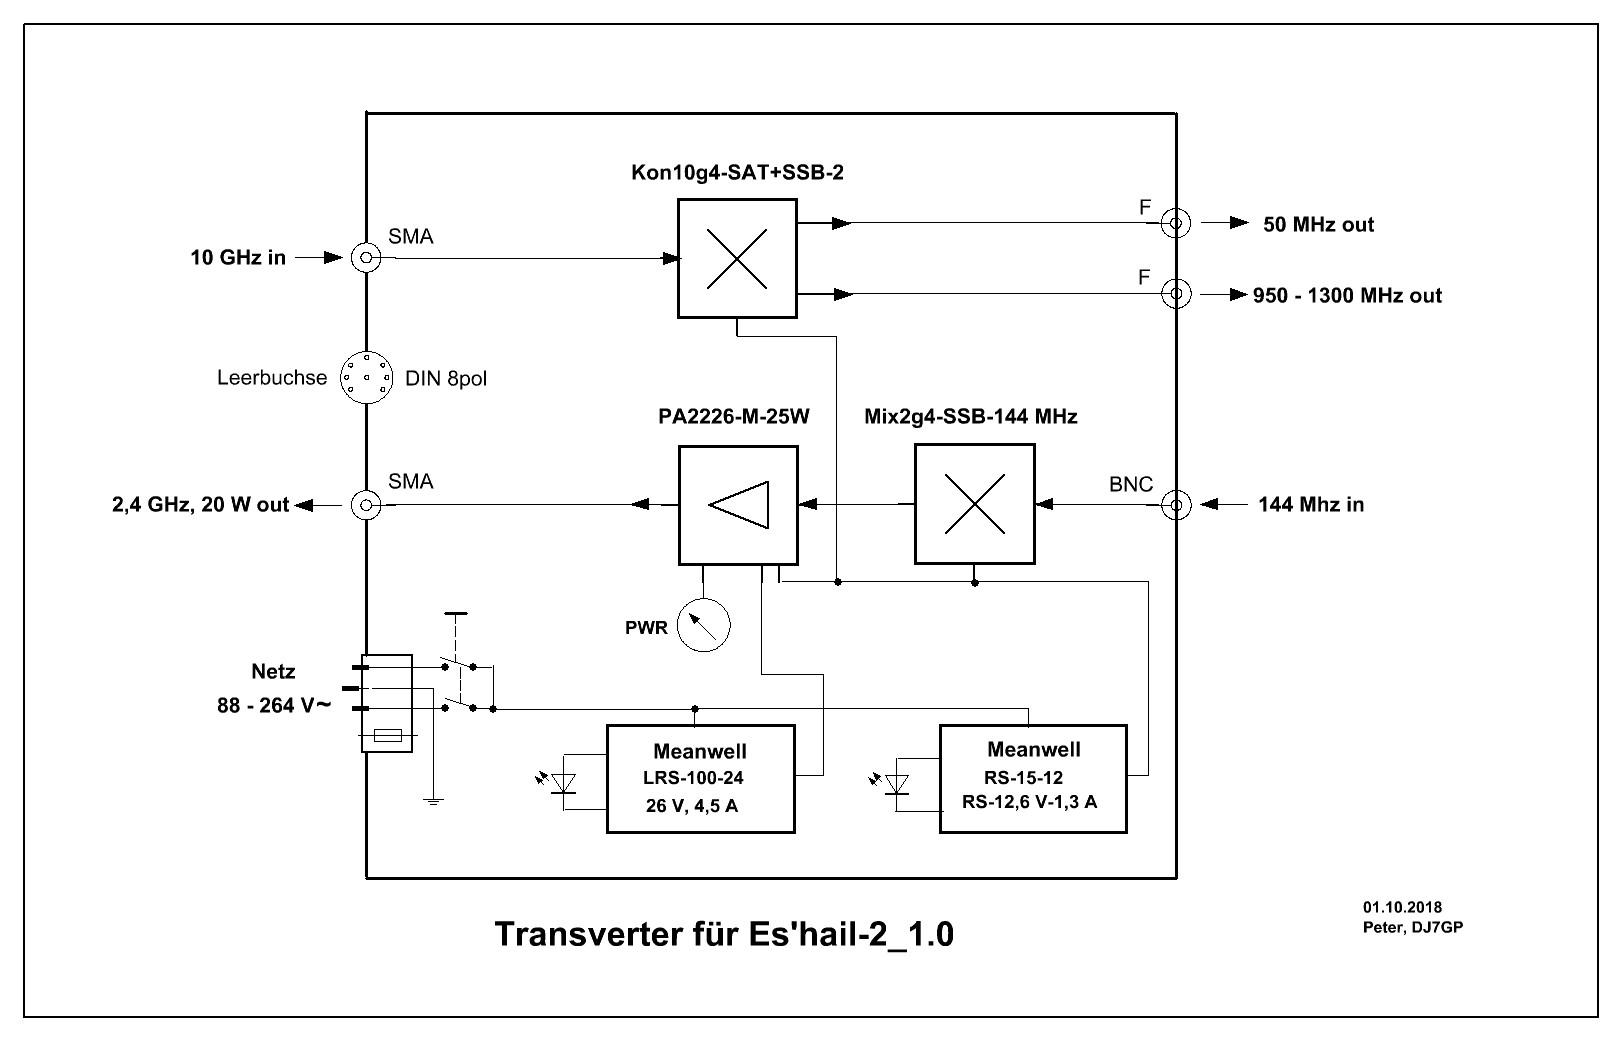 Es'hail-2 Transverter - Hardware - AMSAT Deutschland e V  Forum